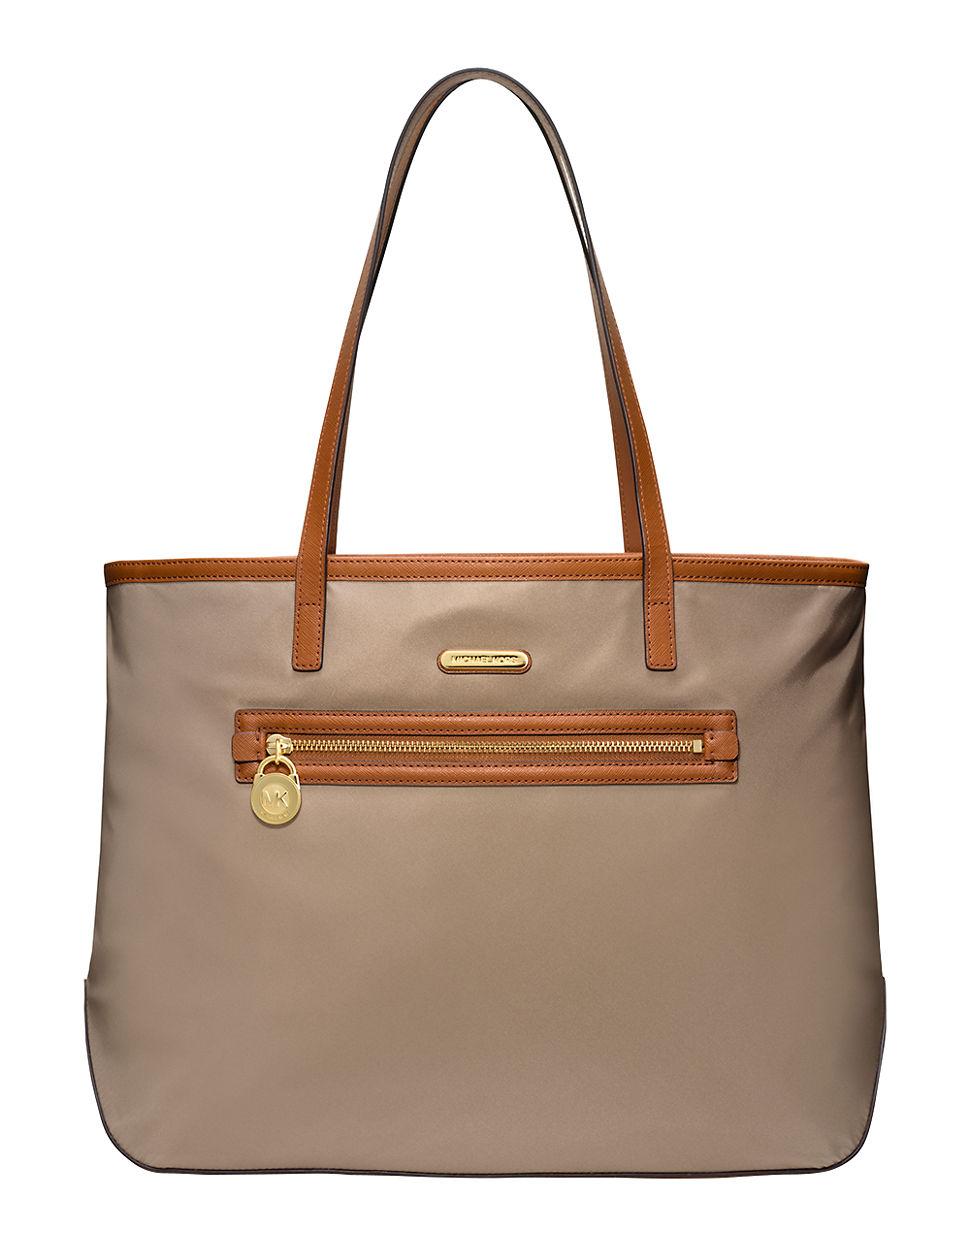 36a7f04755c1be Lyst - MICHAEL Michael Kors Kempton Large Nylon East West Tote Bag ...